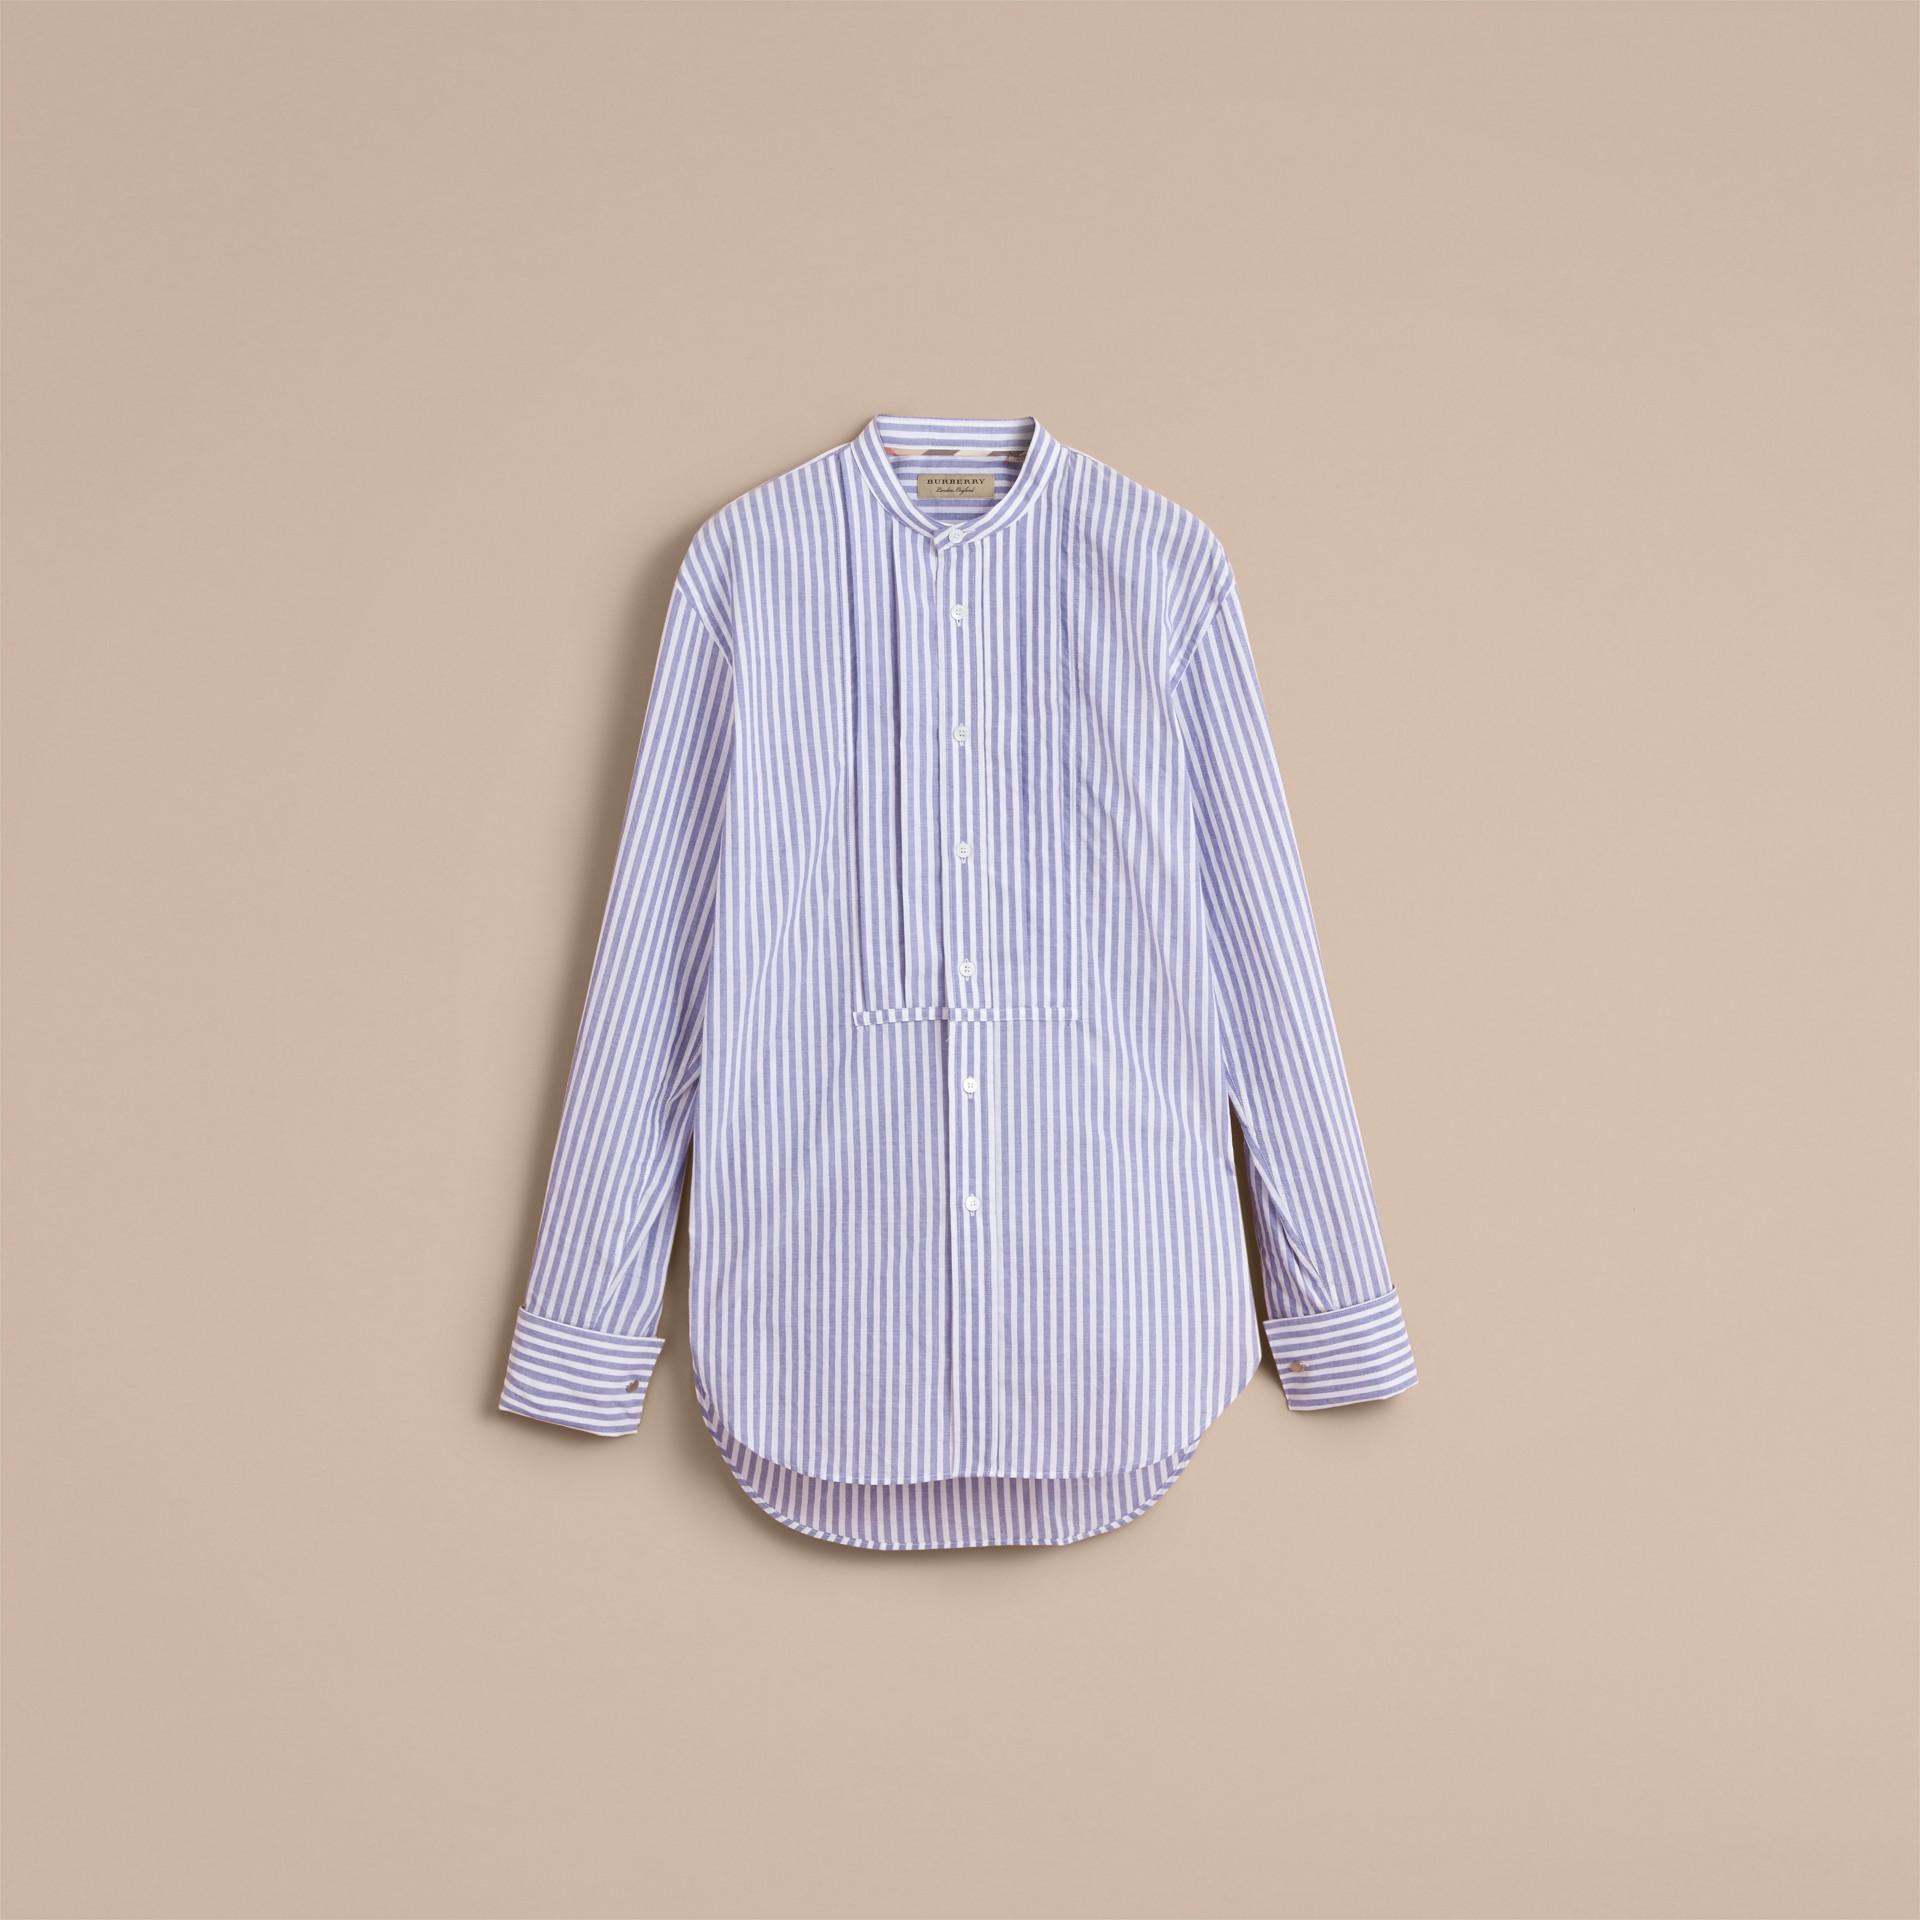 Unisex Pleated Bib Striped Cotton Shirt - gallery image 4